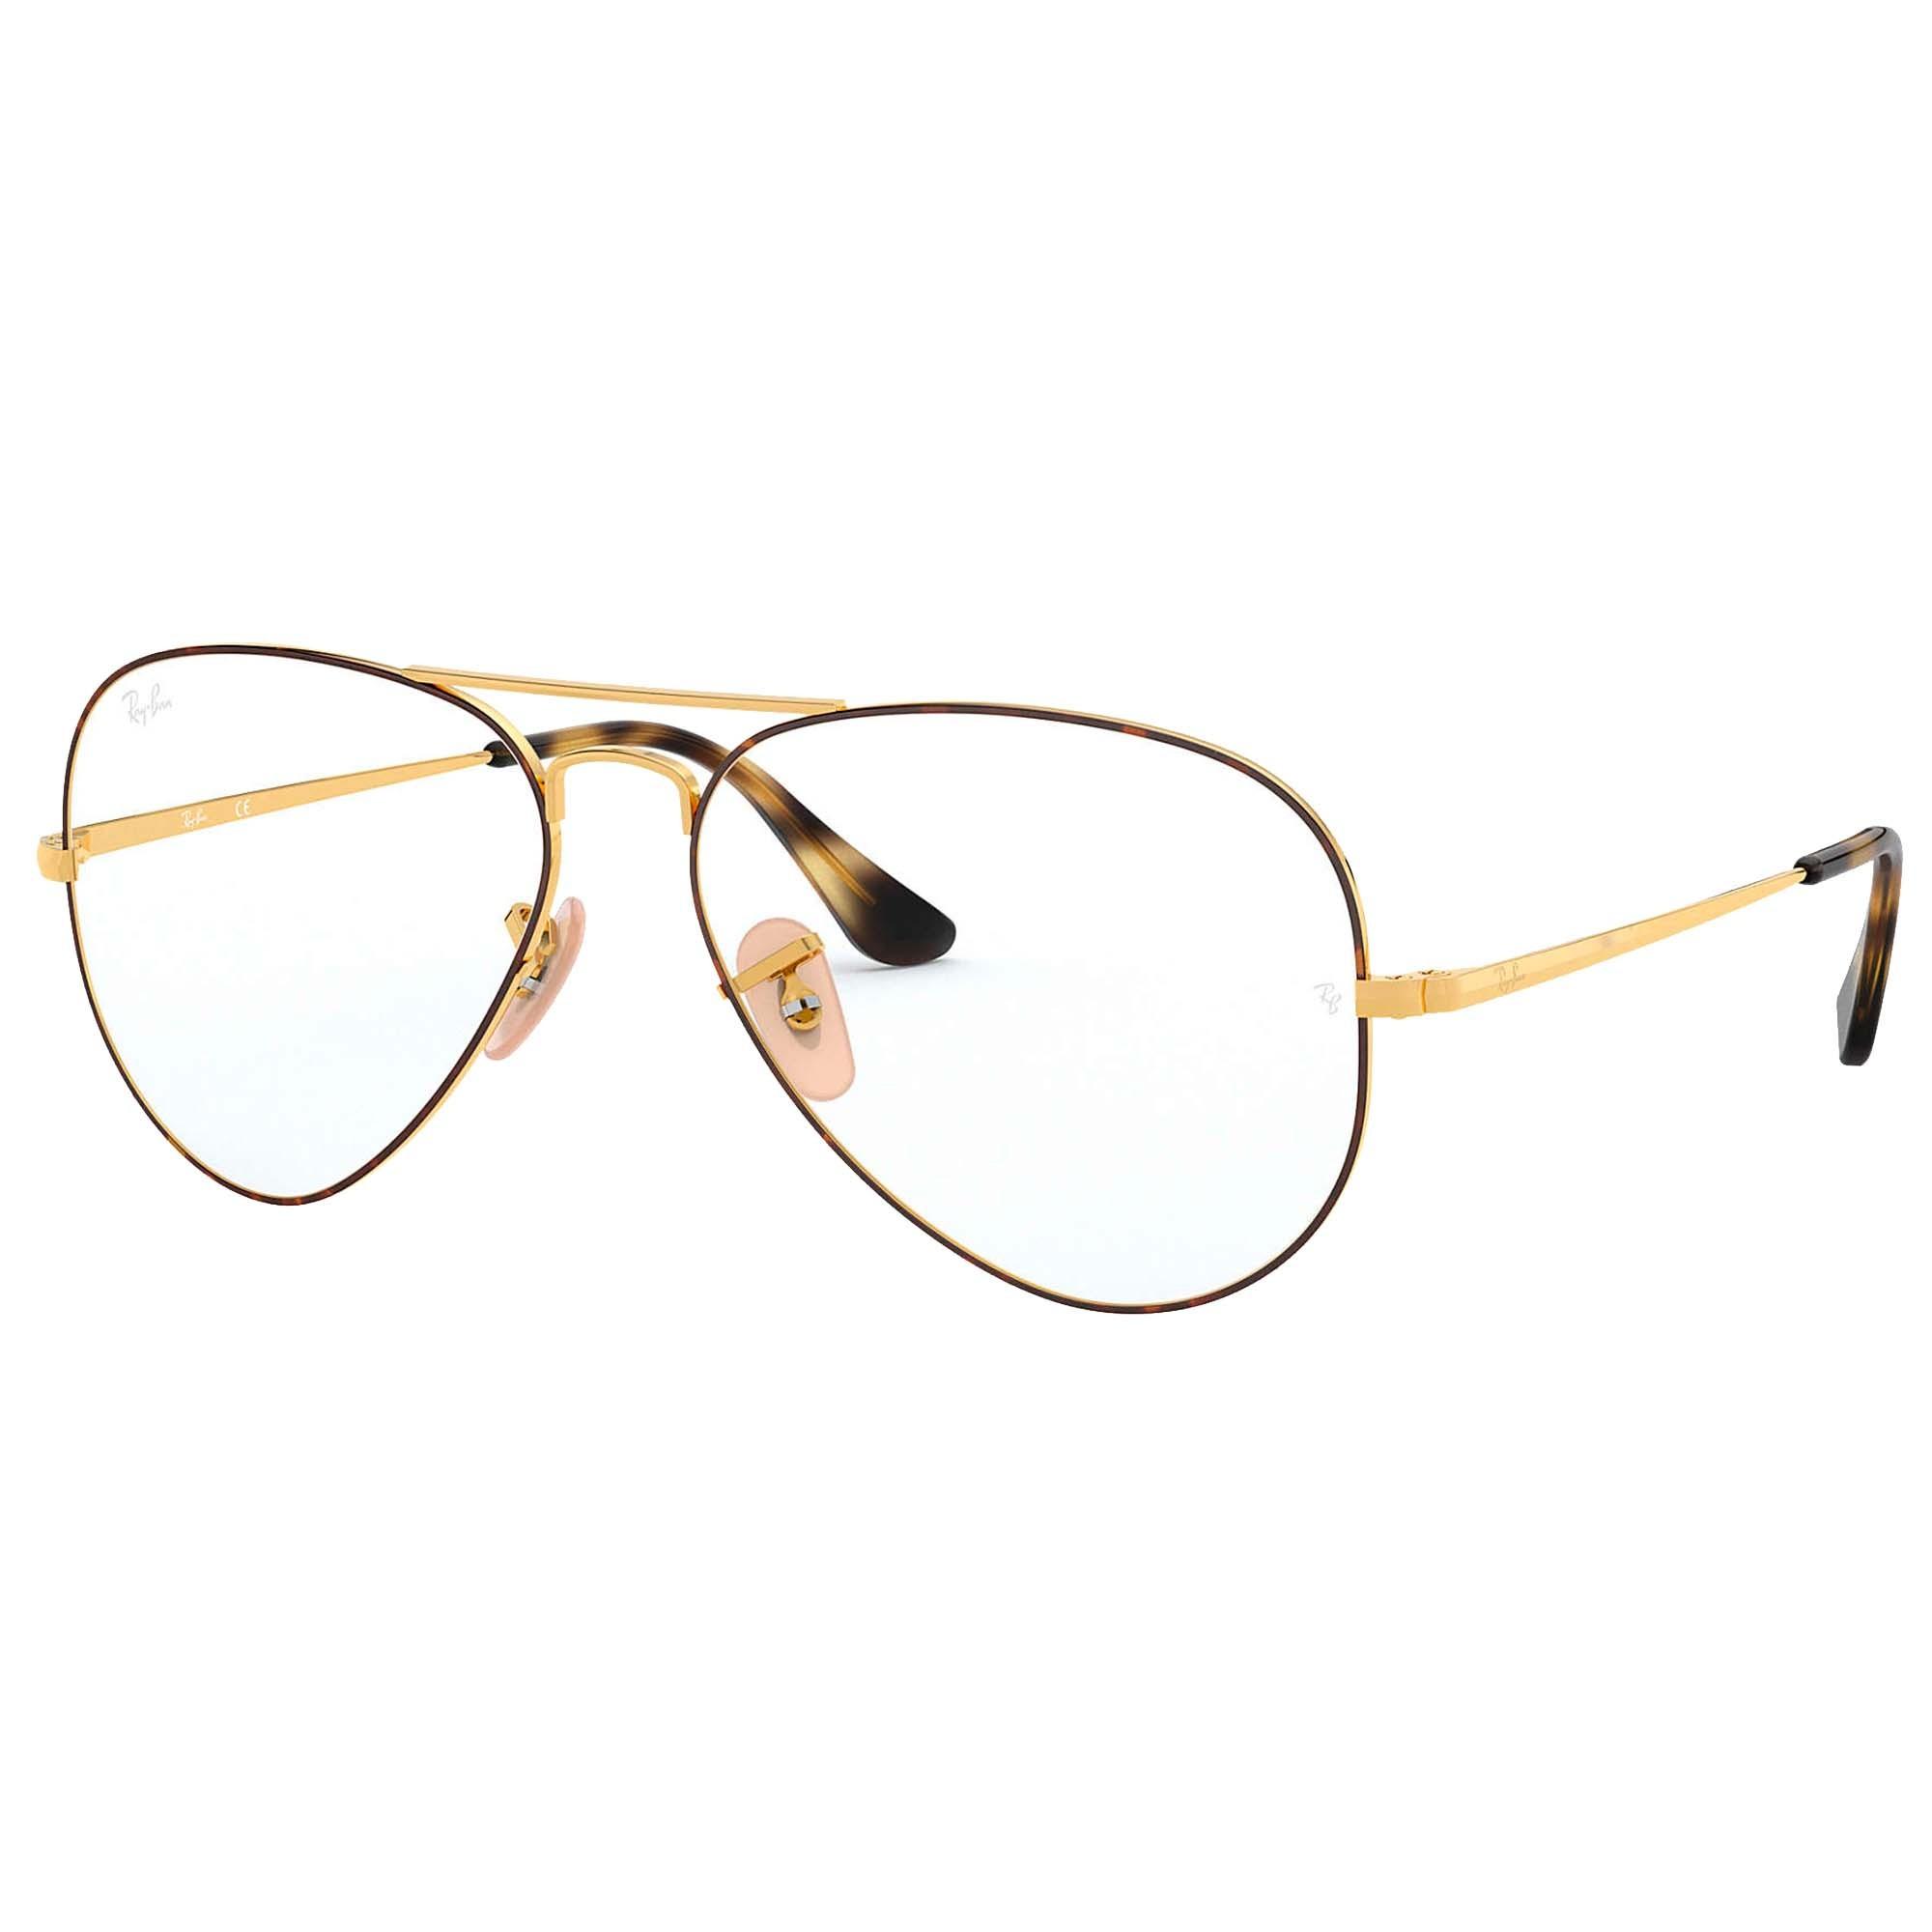 Óculos de Grau Masculino Ray-Ban Aviator Optics RB6489 2945 58-14